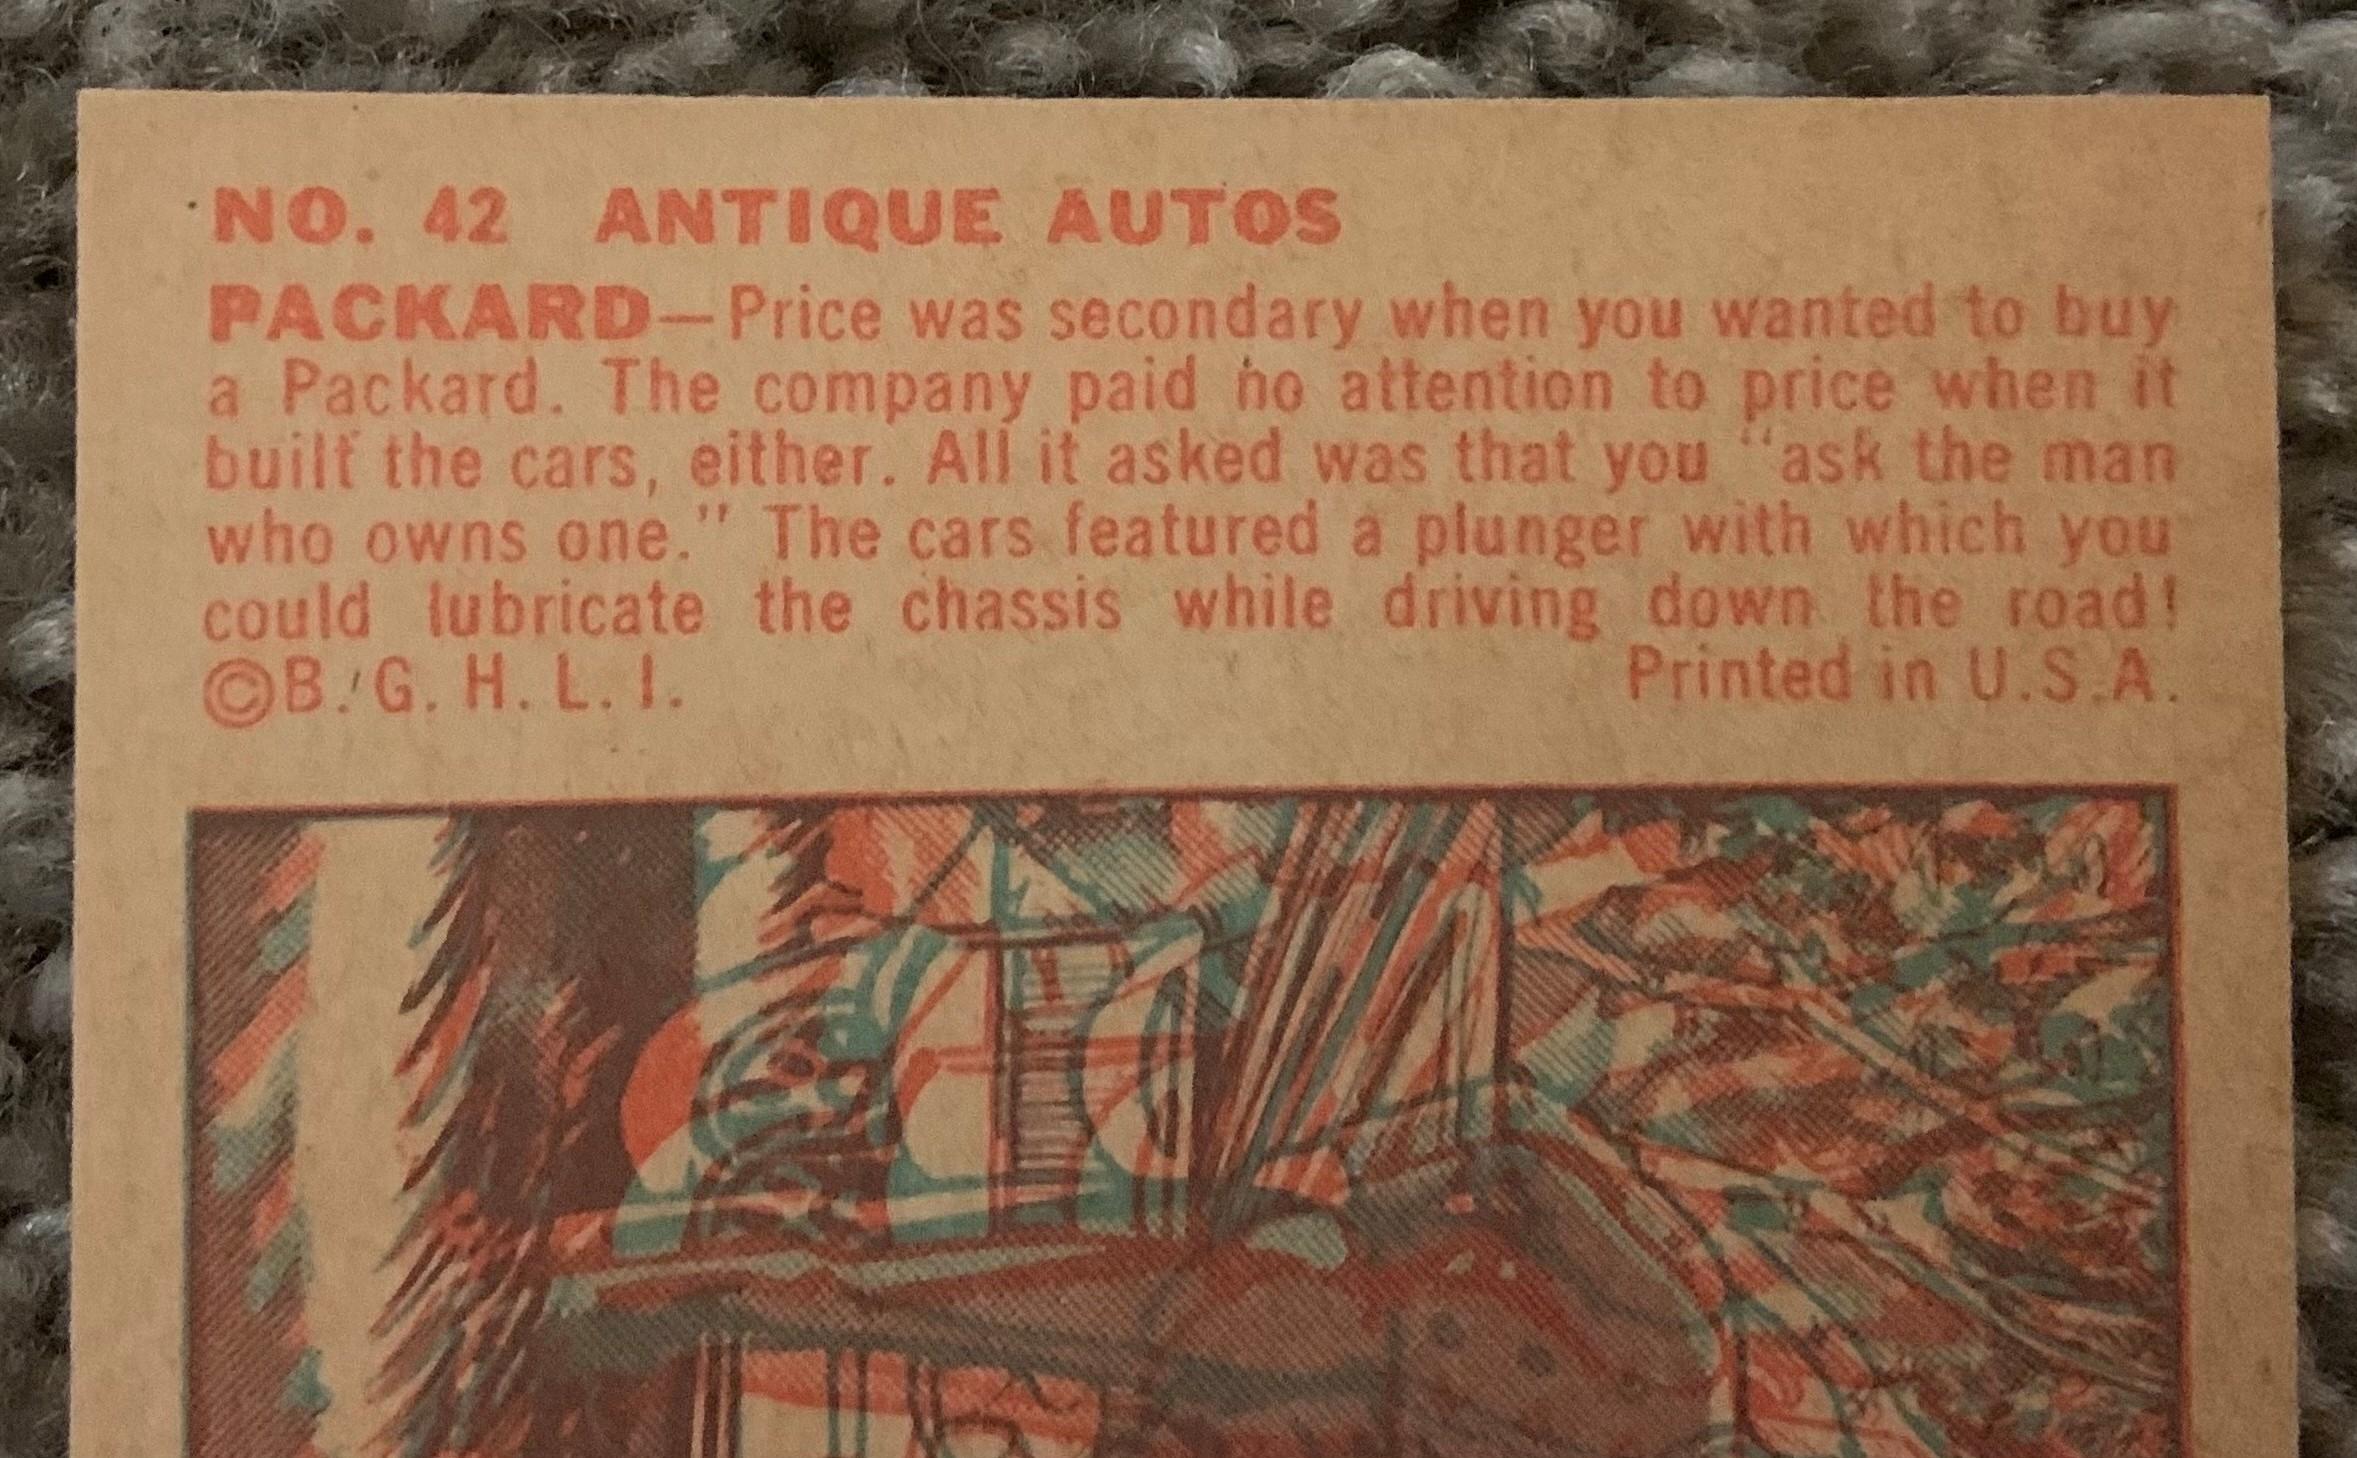 1953 Bowman Antique Autos - No. 42 Packard copy on back